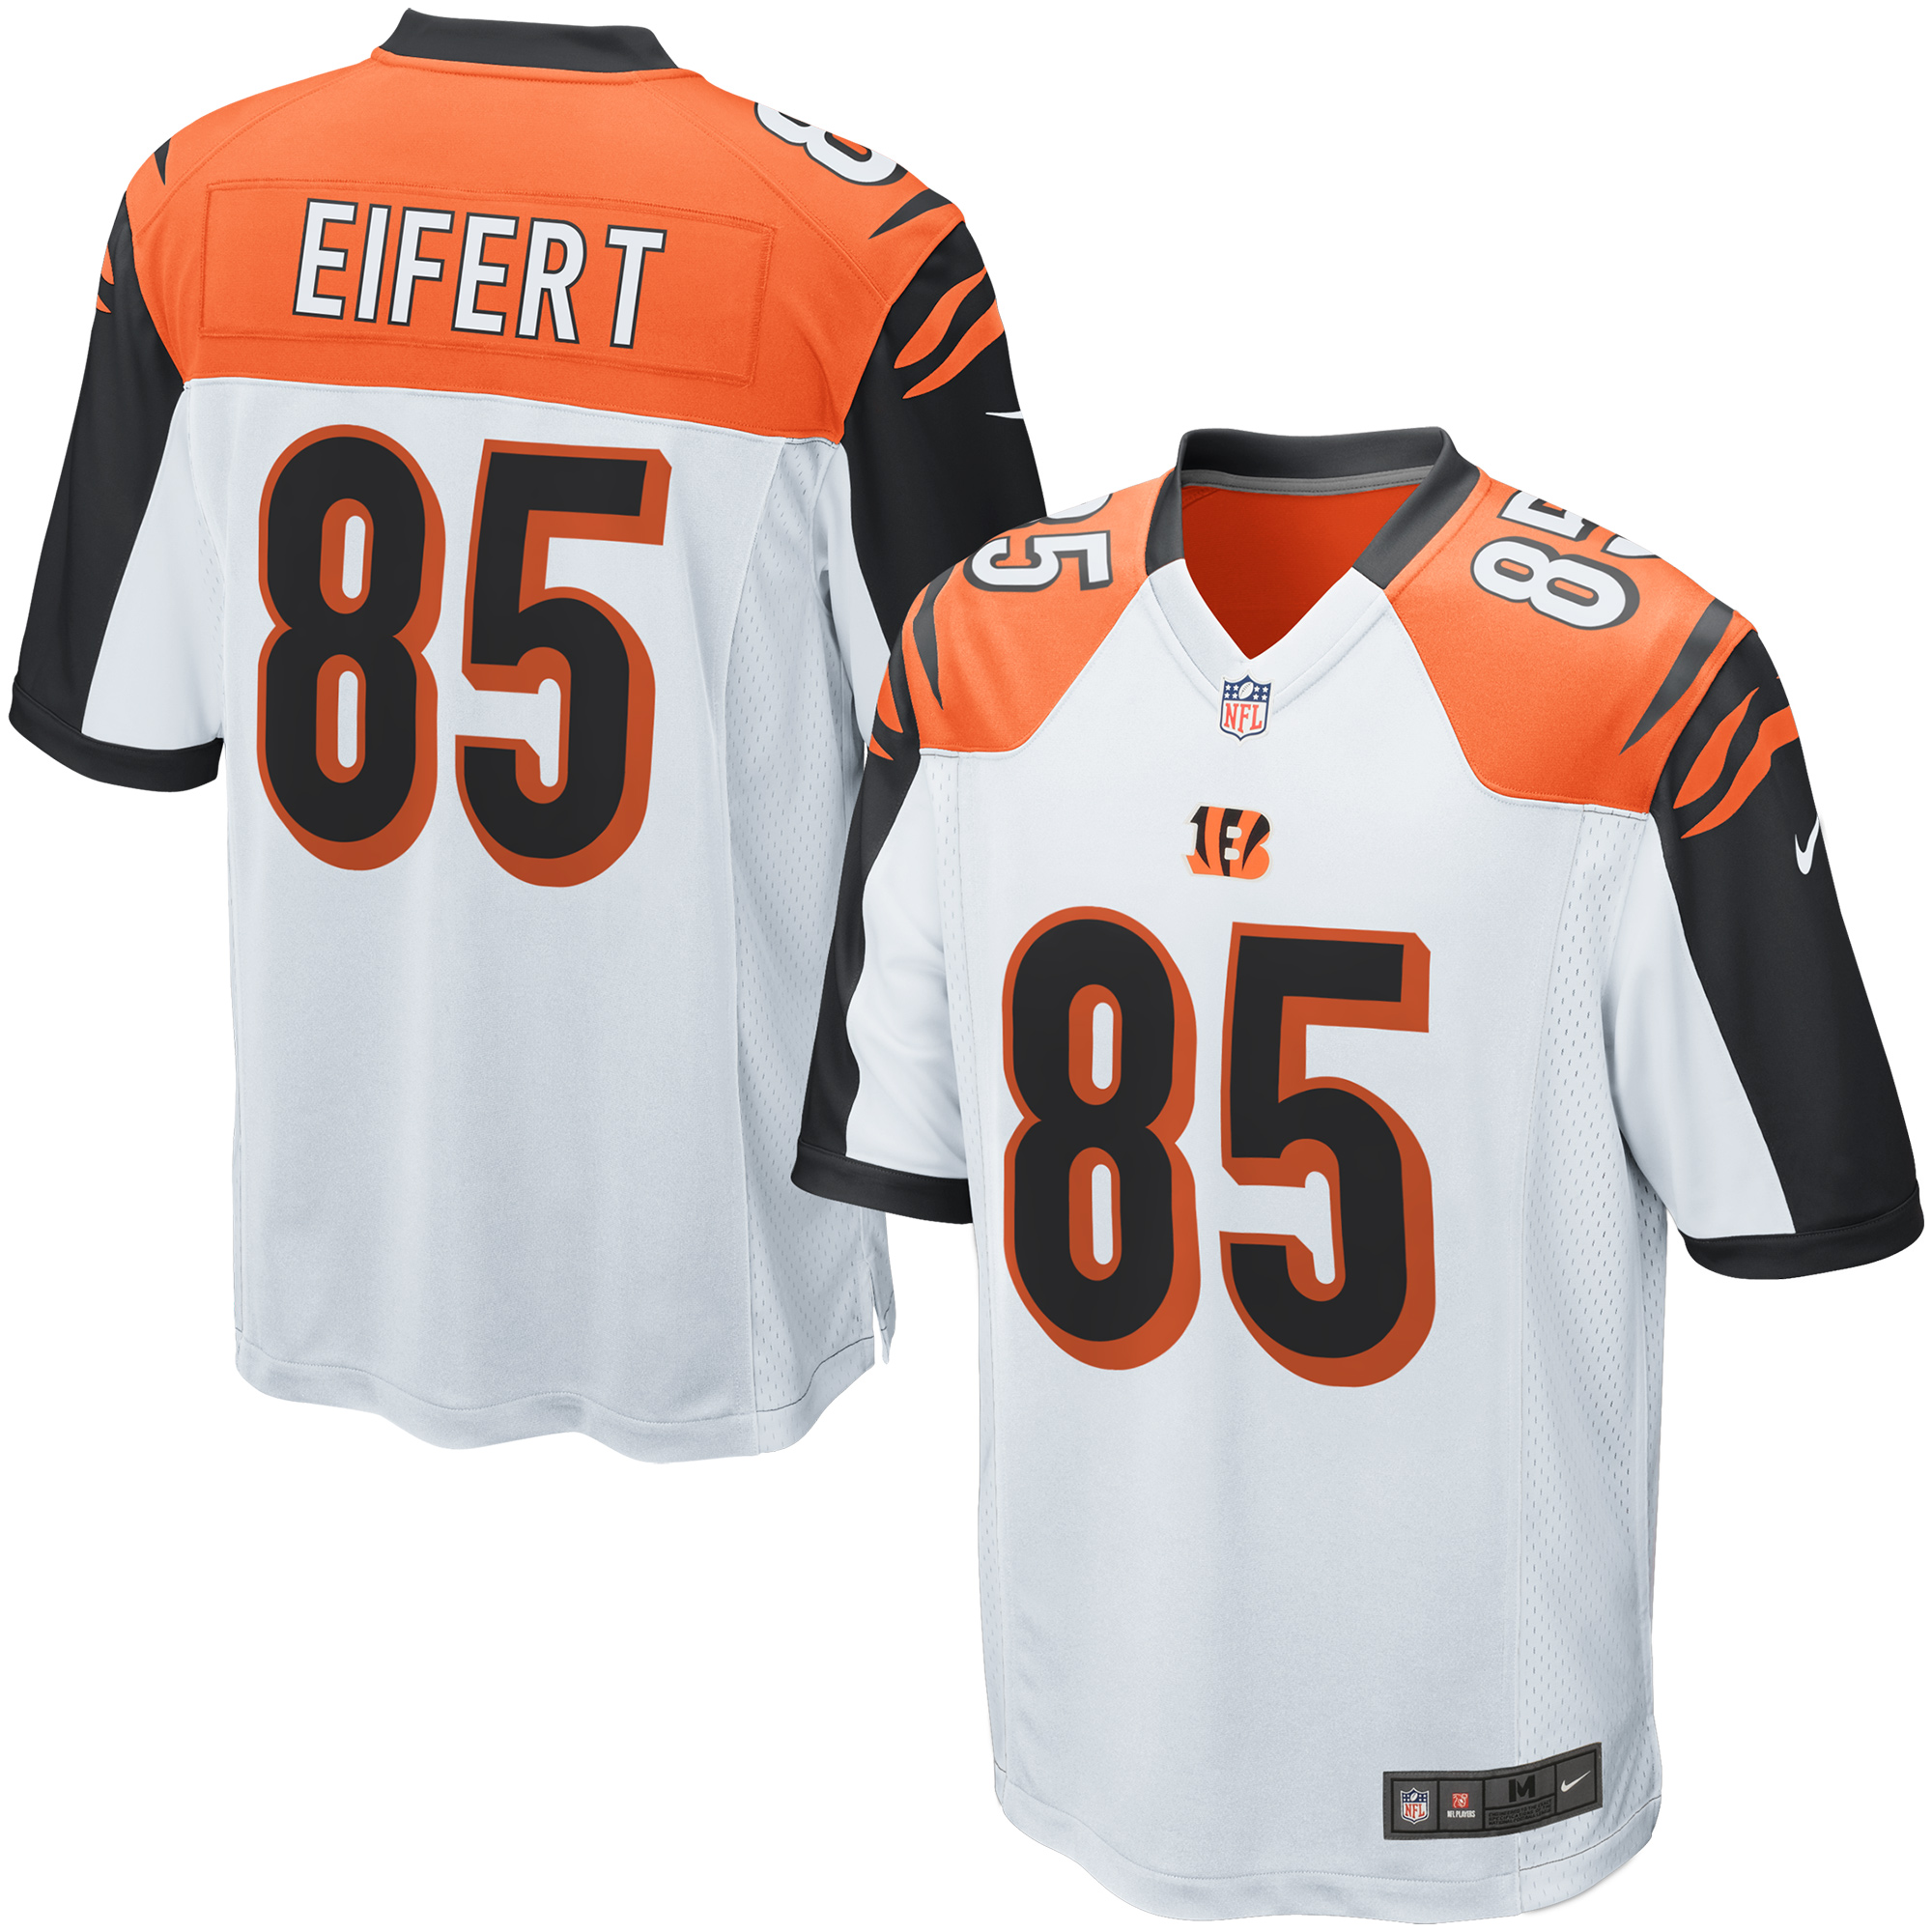 Tyler Eifert Cincinnati Bengals Nike Game Jersey - White